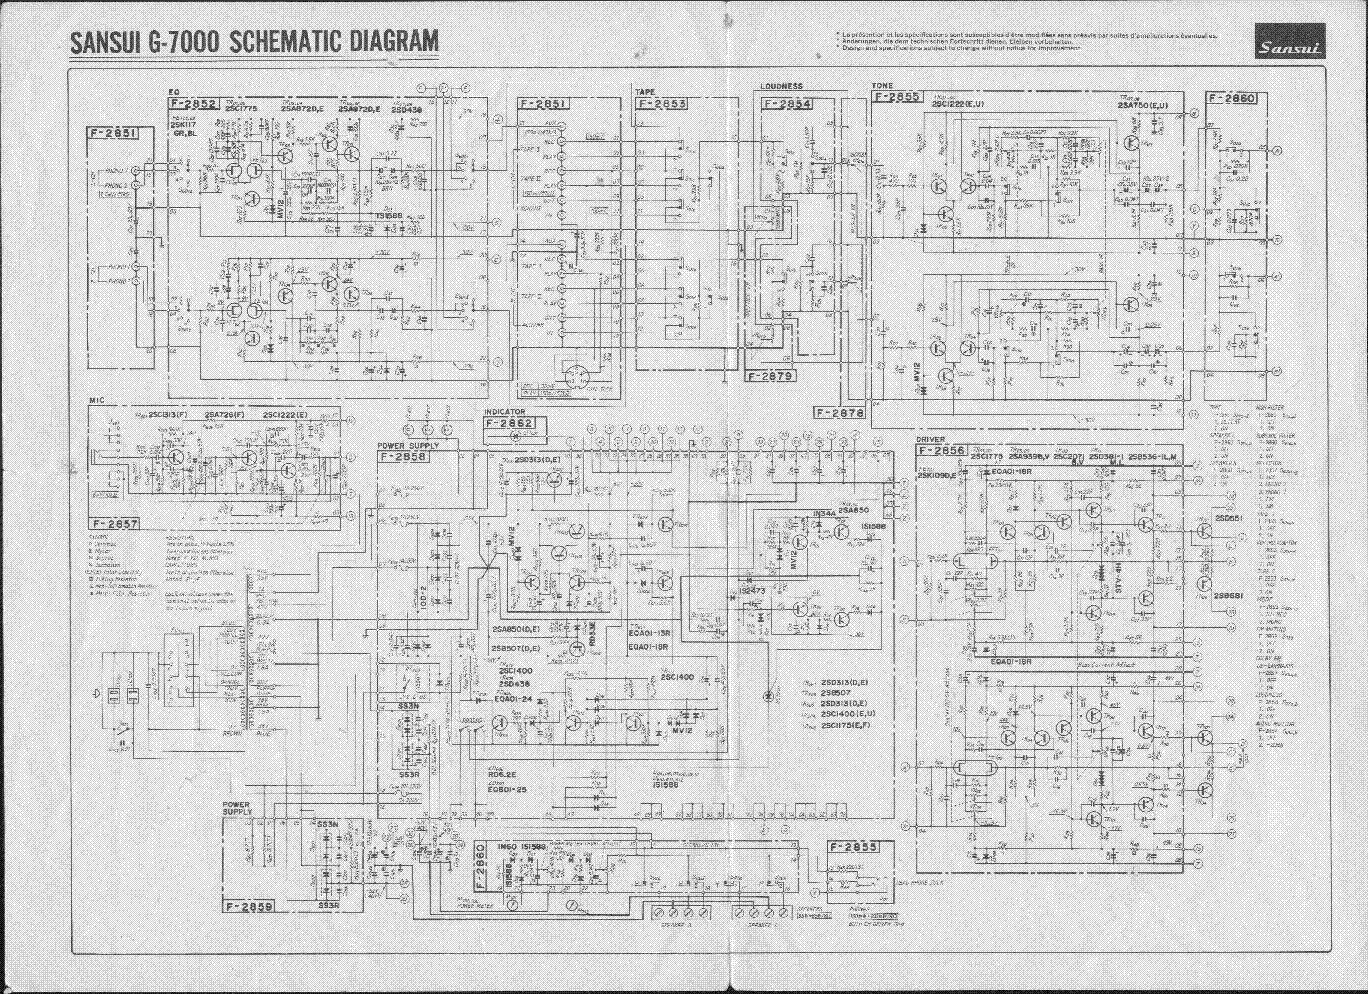 sansui g7000 sch service manual free download schematics eeprom rh pinterest com Online Repair Guide Honda Repair Guide